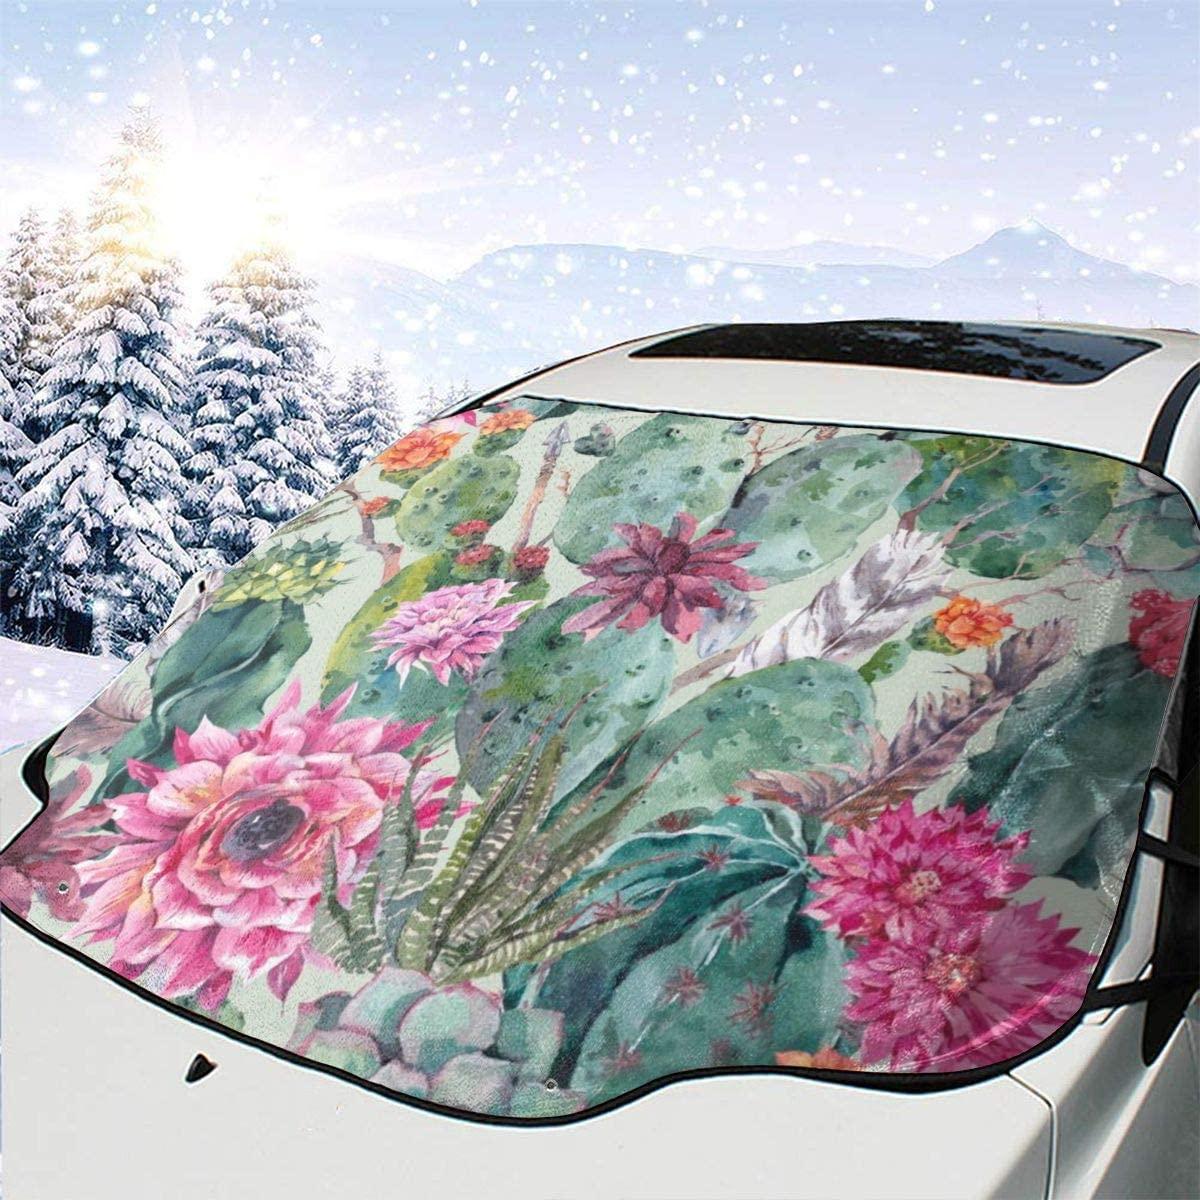 THONFIRE Car Front Window Windshield Ice Sun Shade Boho Cactus Flower Cover Waterproof Blocks Heat Damage Free Visor Protector Automotive Autumn Heat Reflector